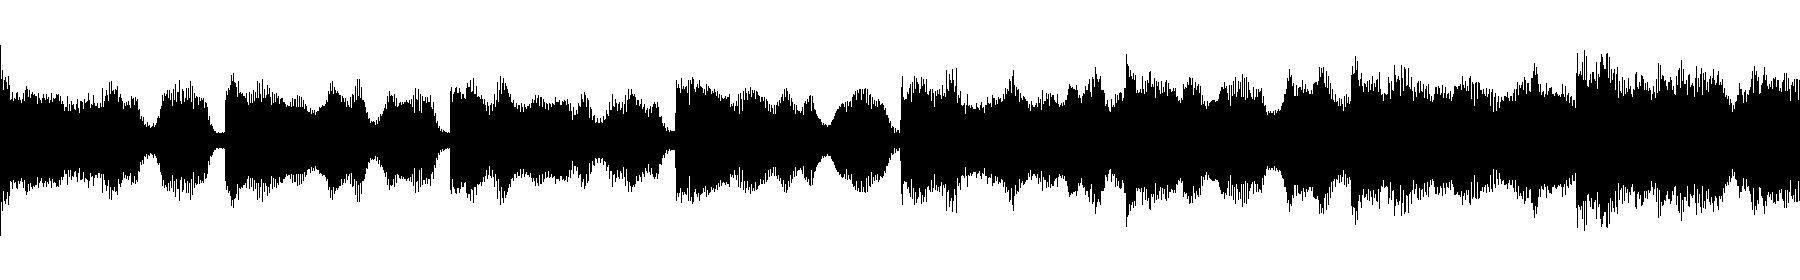 vedh melodyloop 096 fm7 g d c 124 bpm